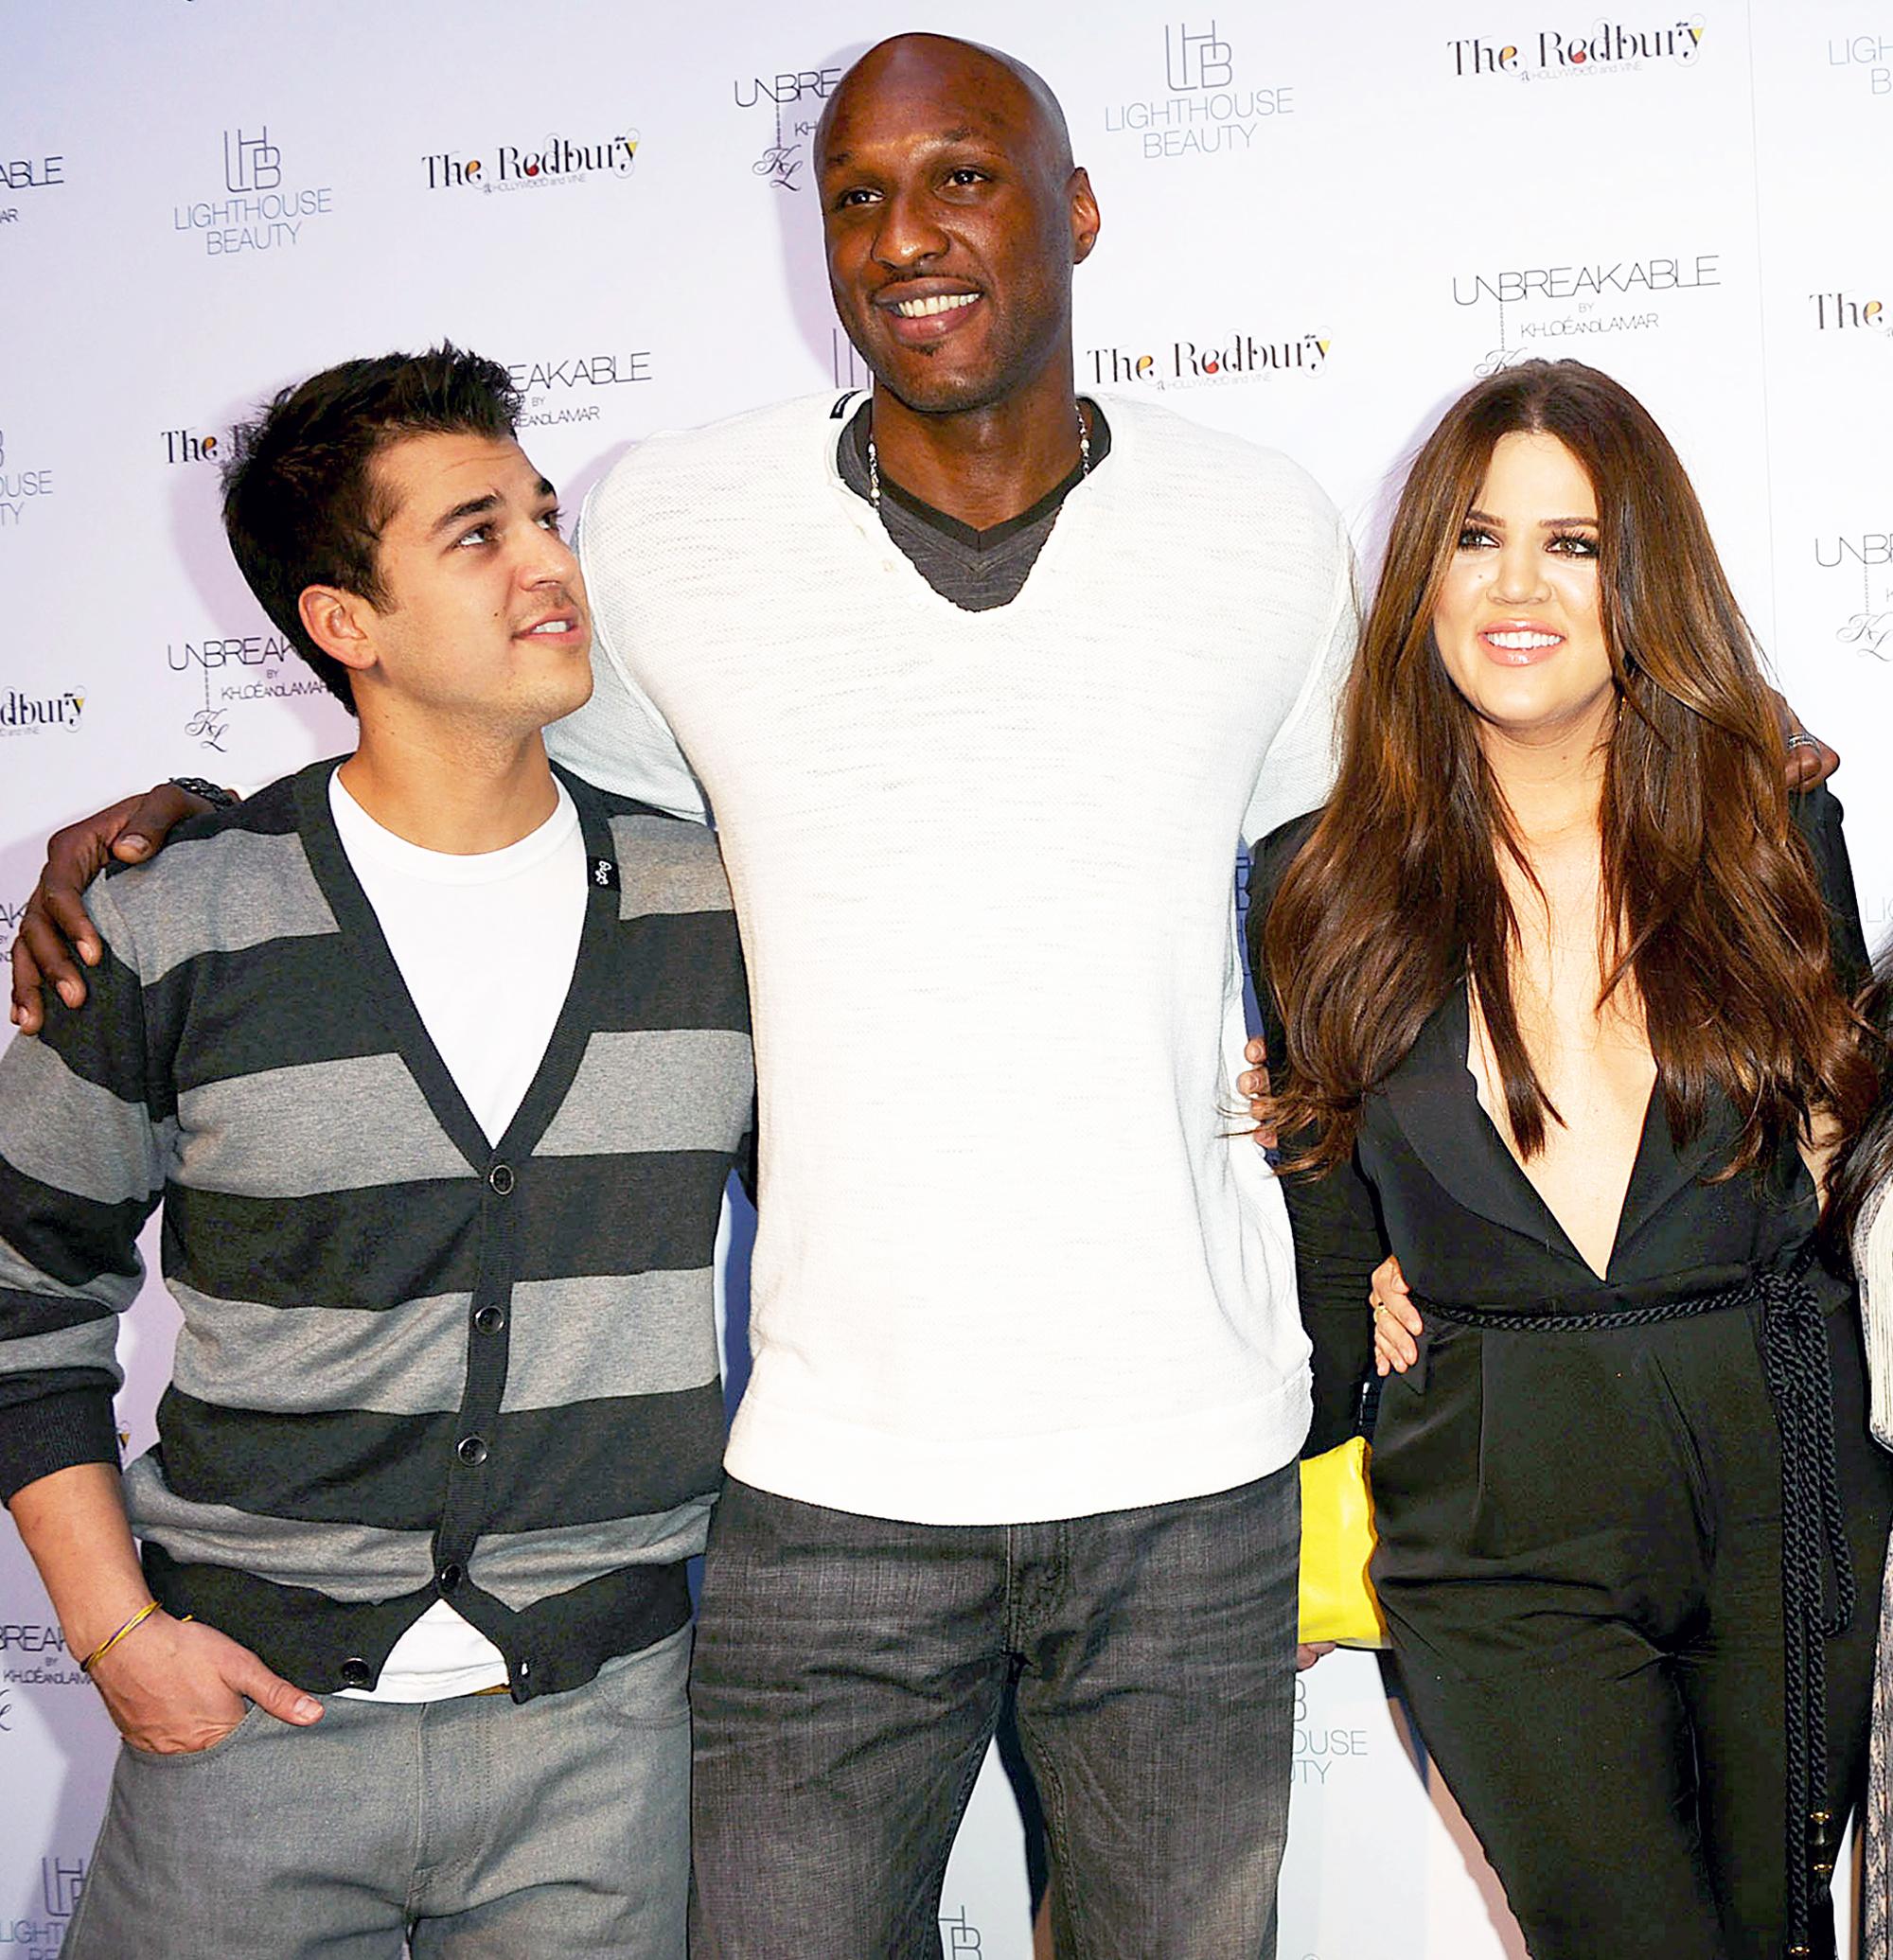 Rob Kardashian, Lamar Odom and Khloe Kardashian